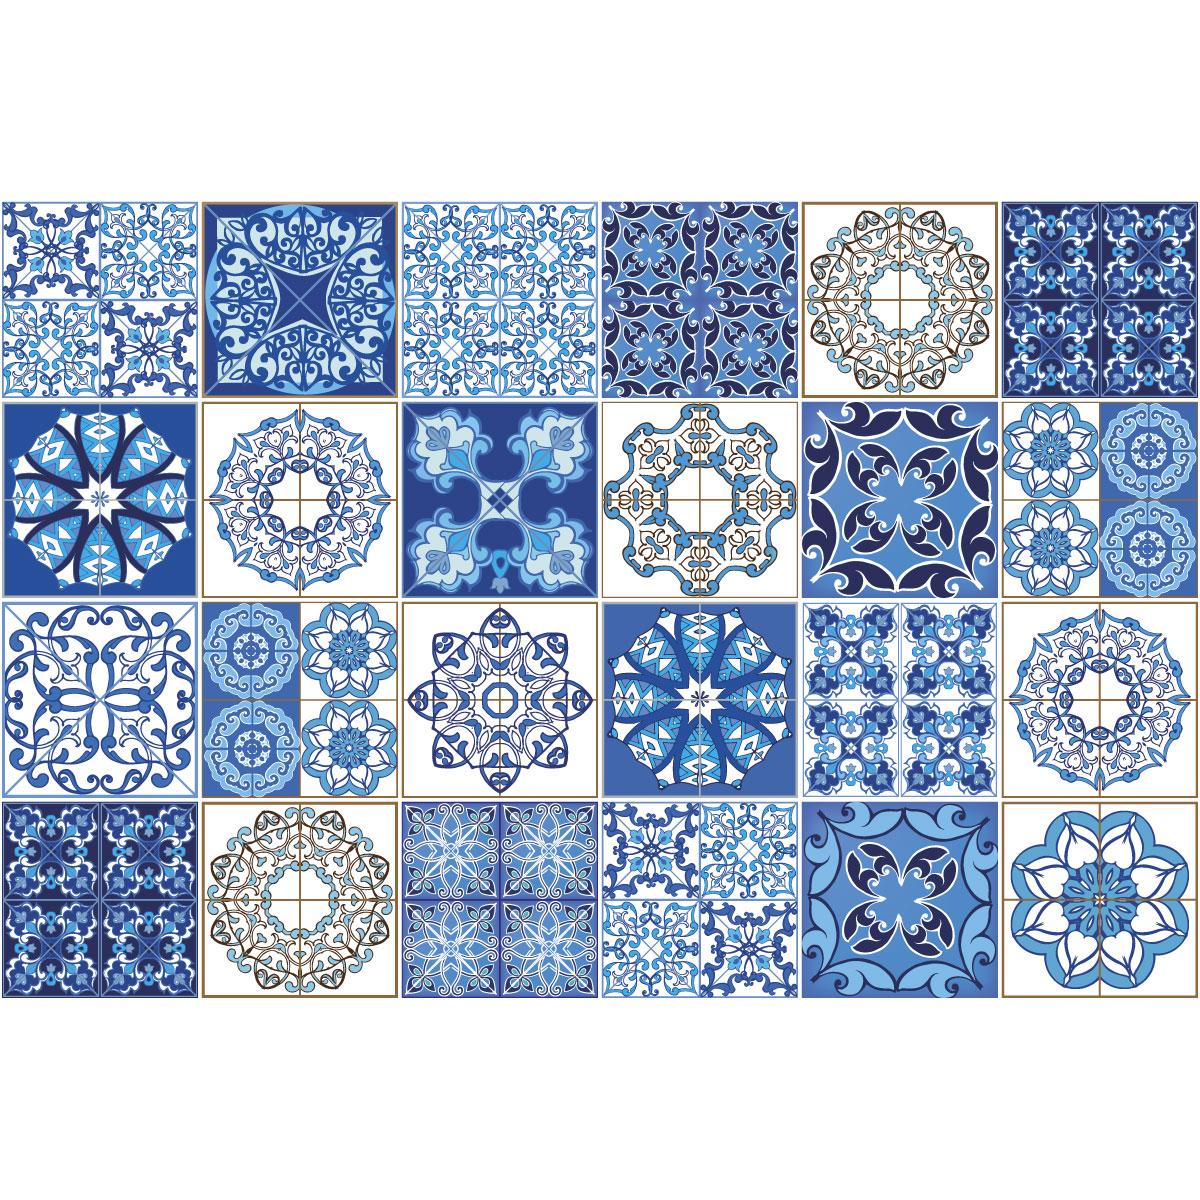 24 stickers carreaux de ciment azulejos azzurra salle de bain mur salle de bain ambiance sticker. Black Bedroom Furniture Sets. Home Design Ideas